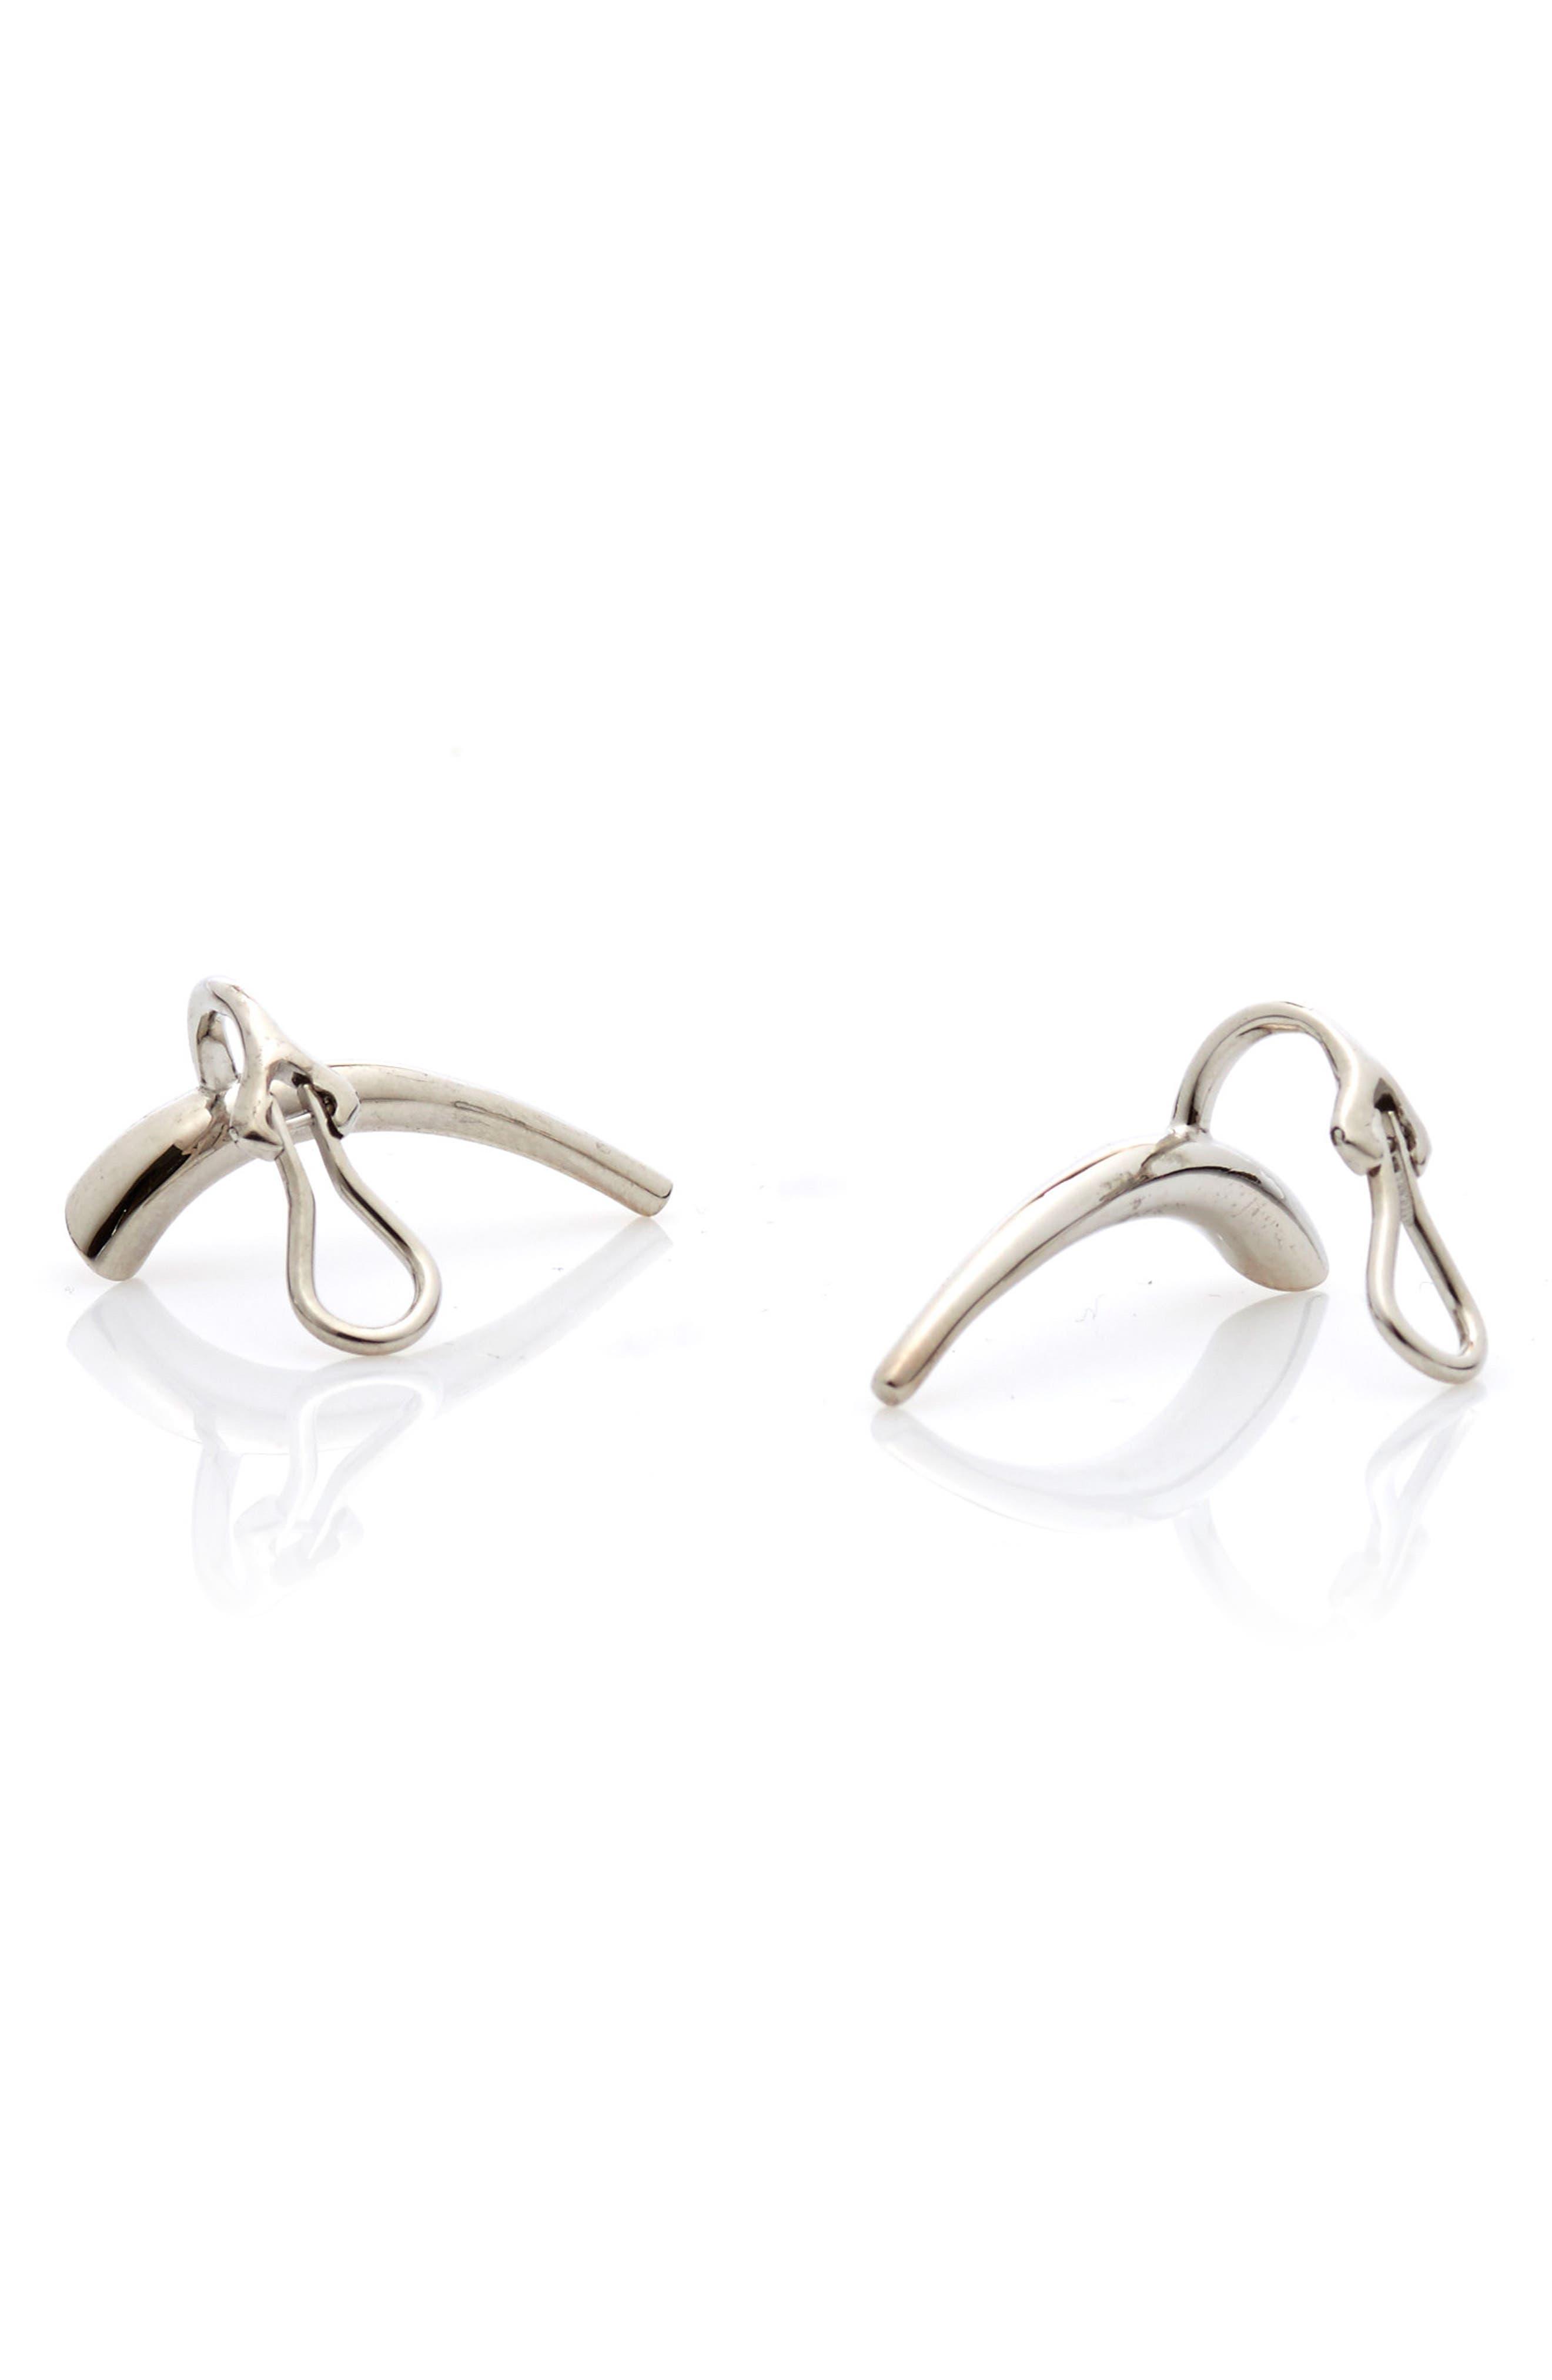 Helix Silver Ear Cuffs,                             Main thumbnail 1, color,